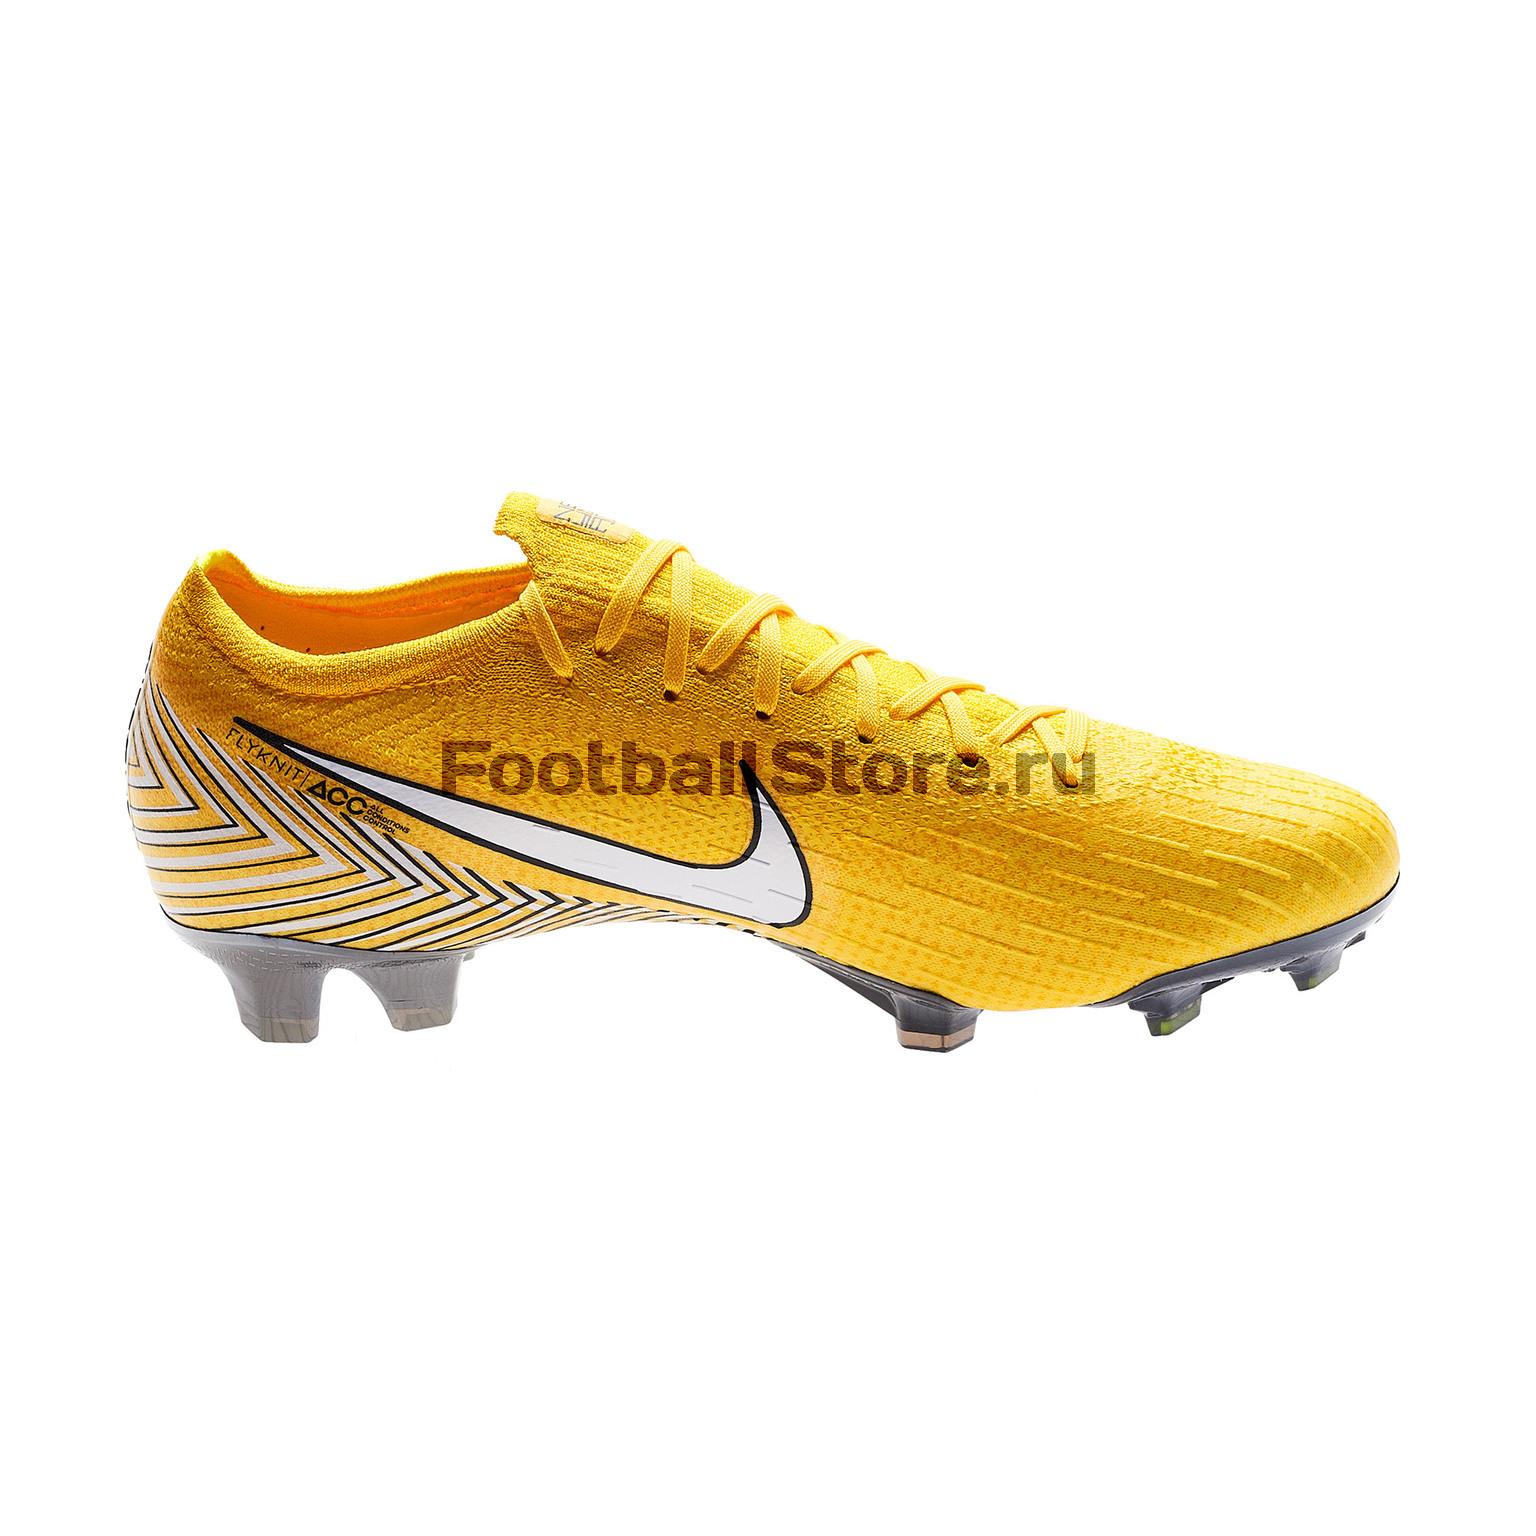 576e1411 Бутсы Nike Vapor 12 Elite Neymar FG AO3126-710 – купить бутсы в ...